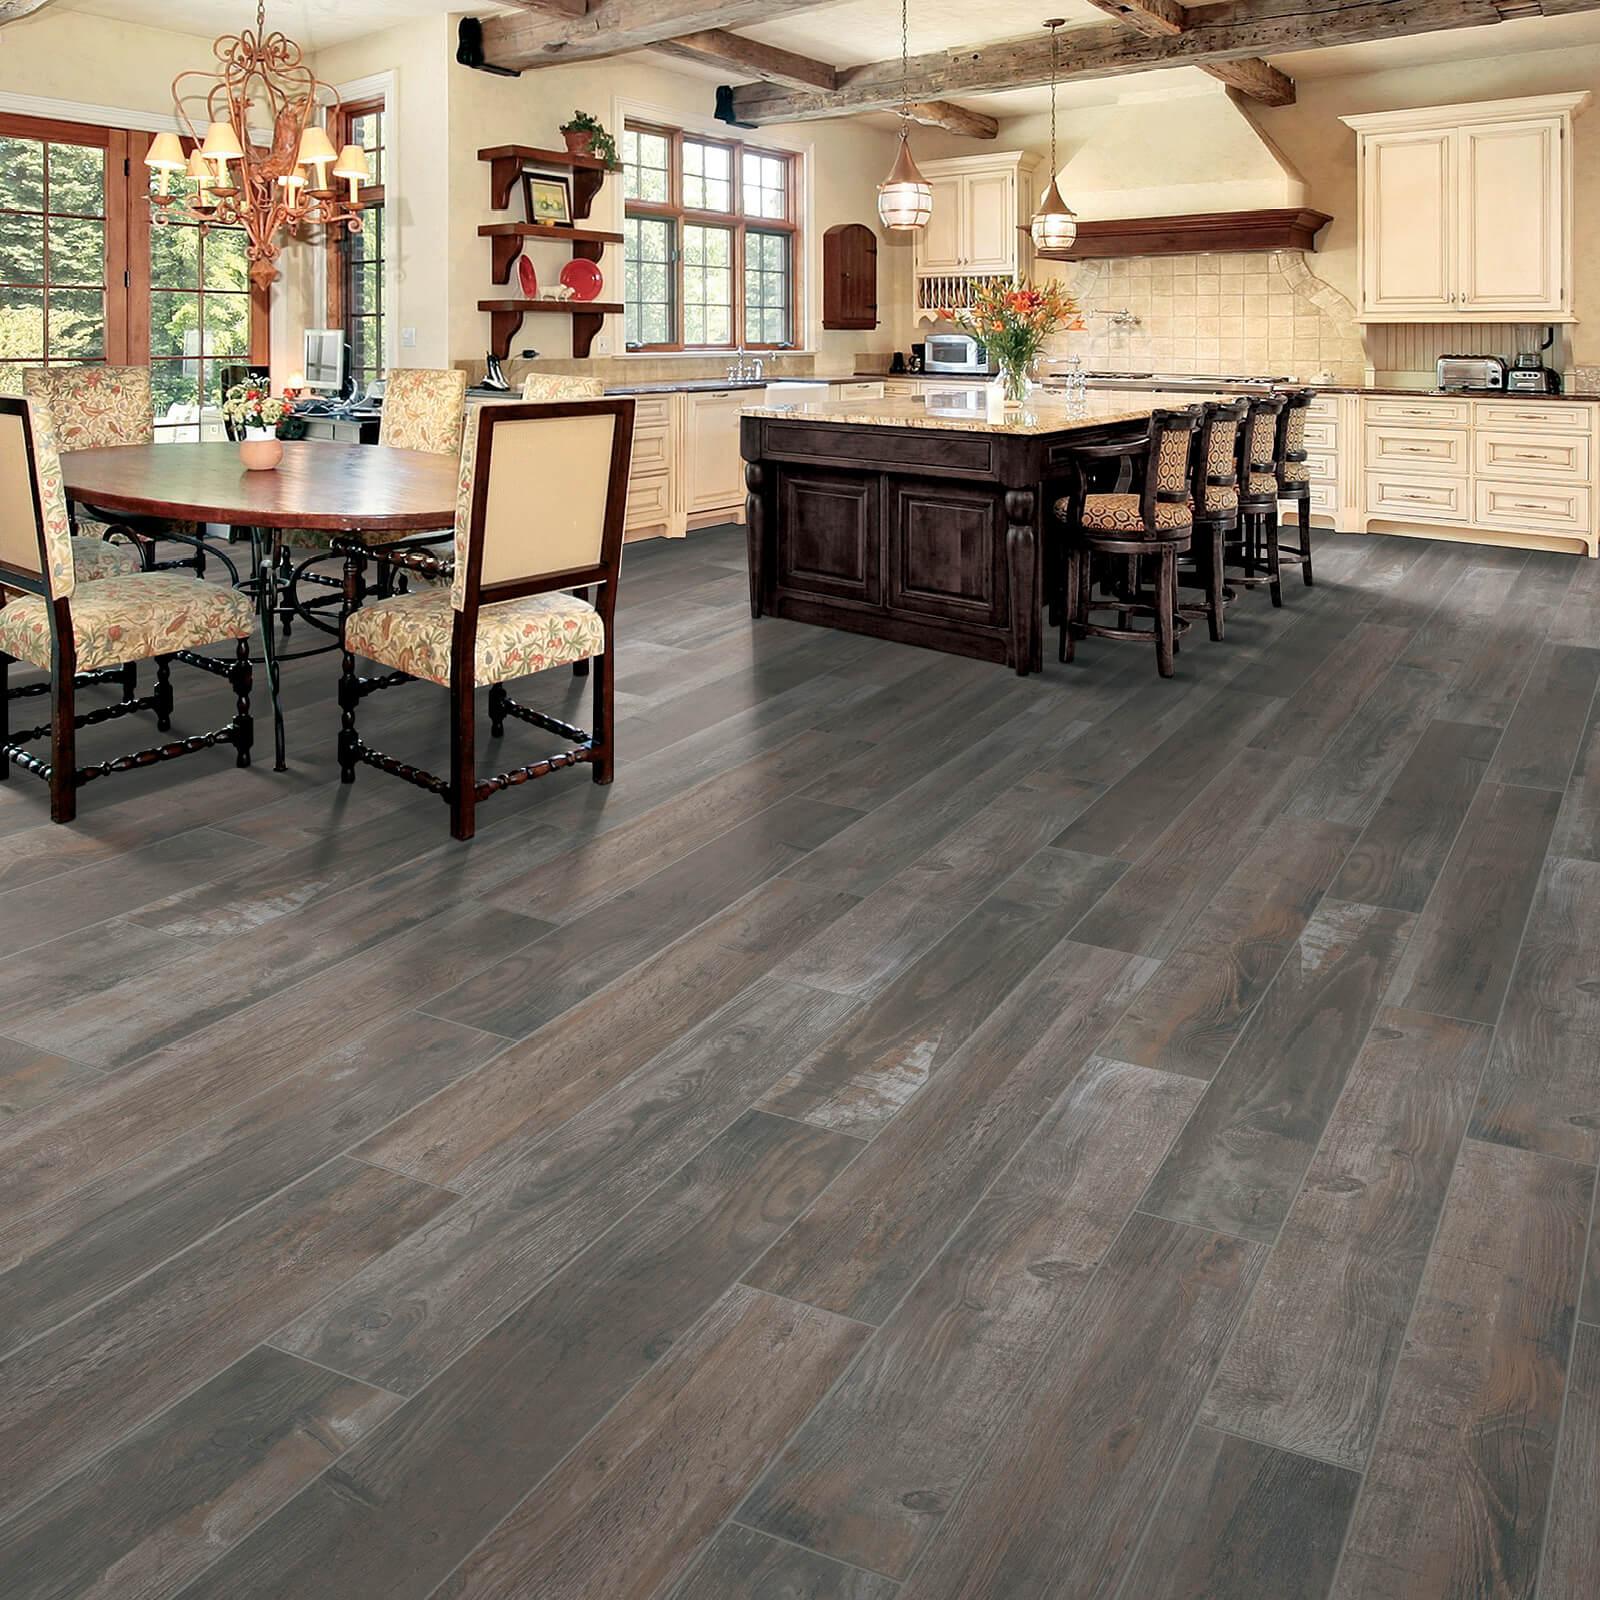 Bryson Valley Truffle Barnwood flooring | Dolphin Carpet & Tile